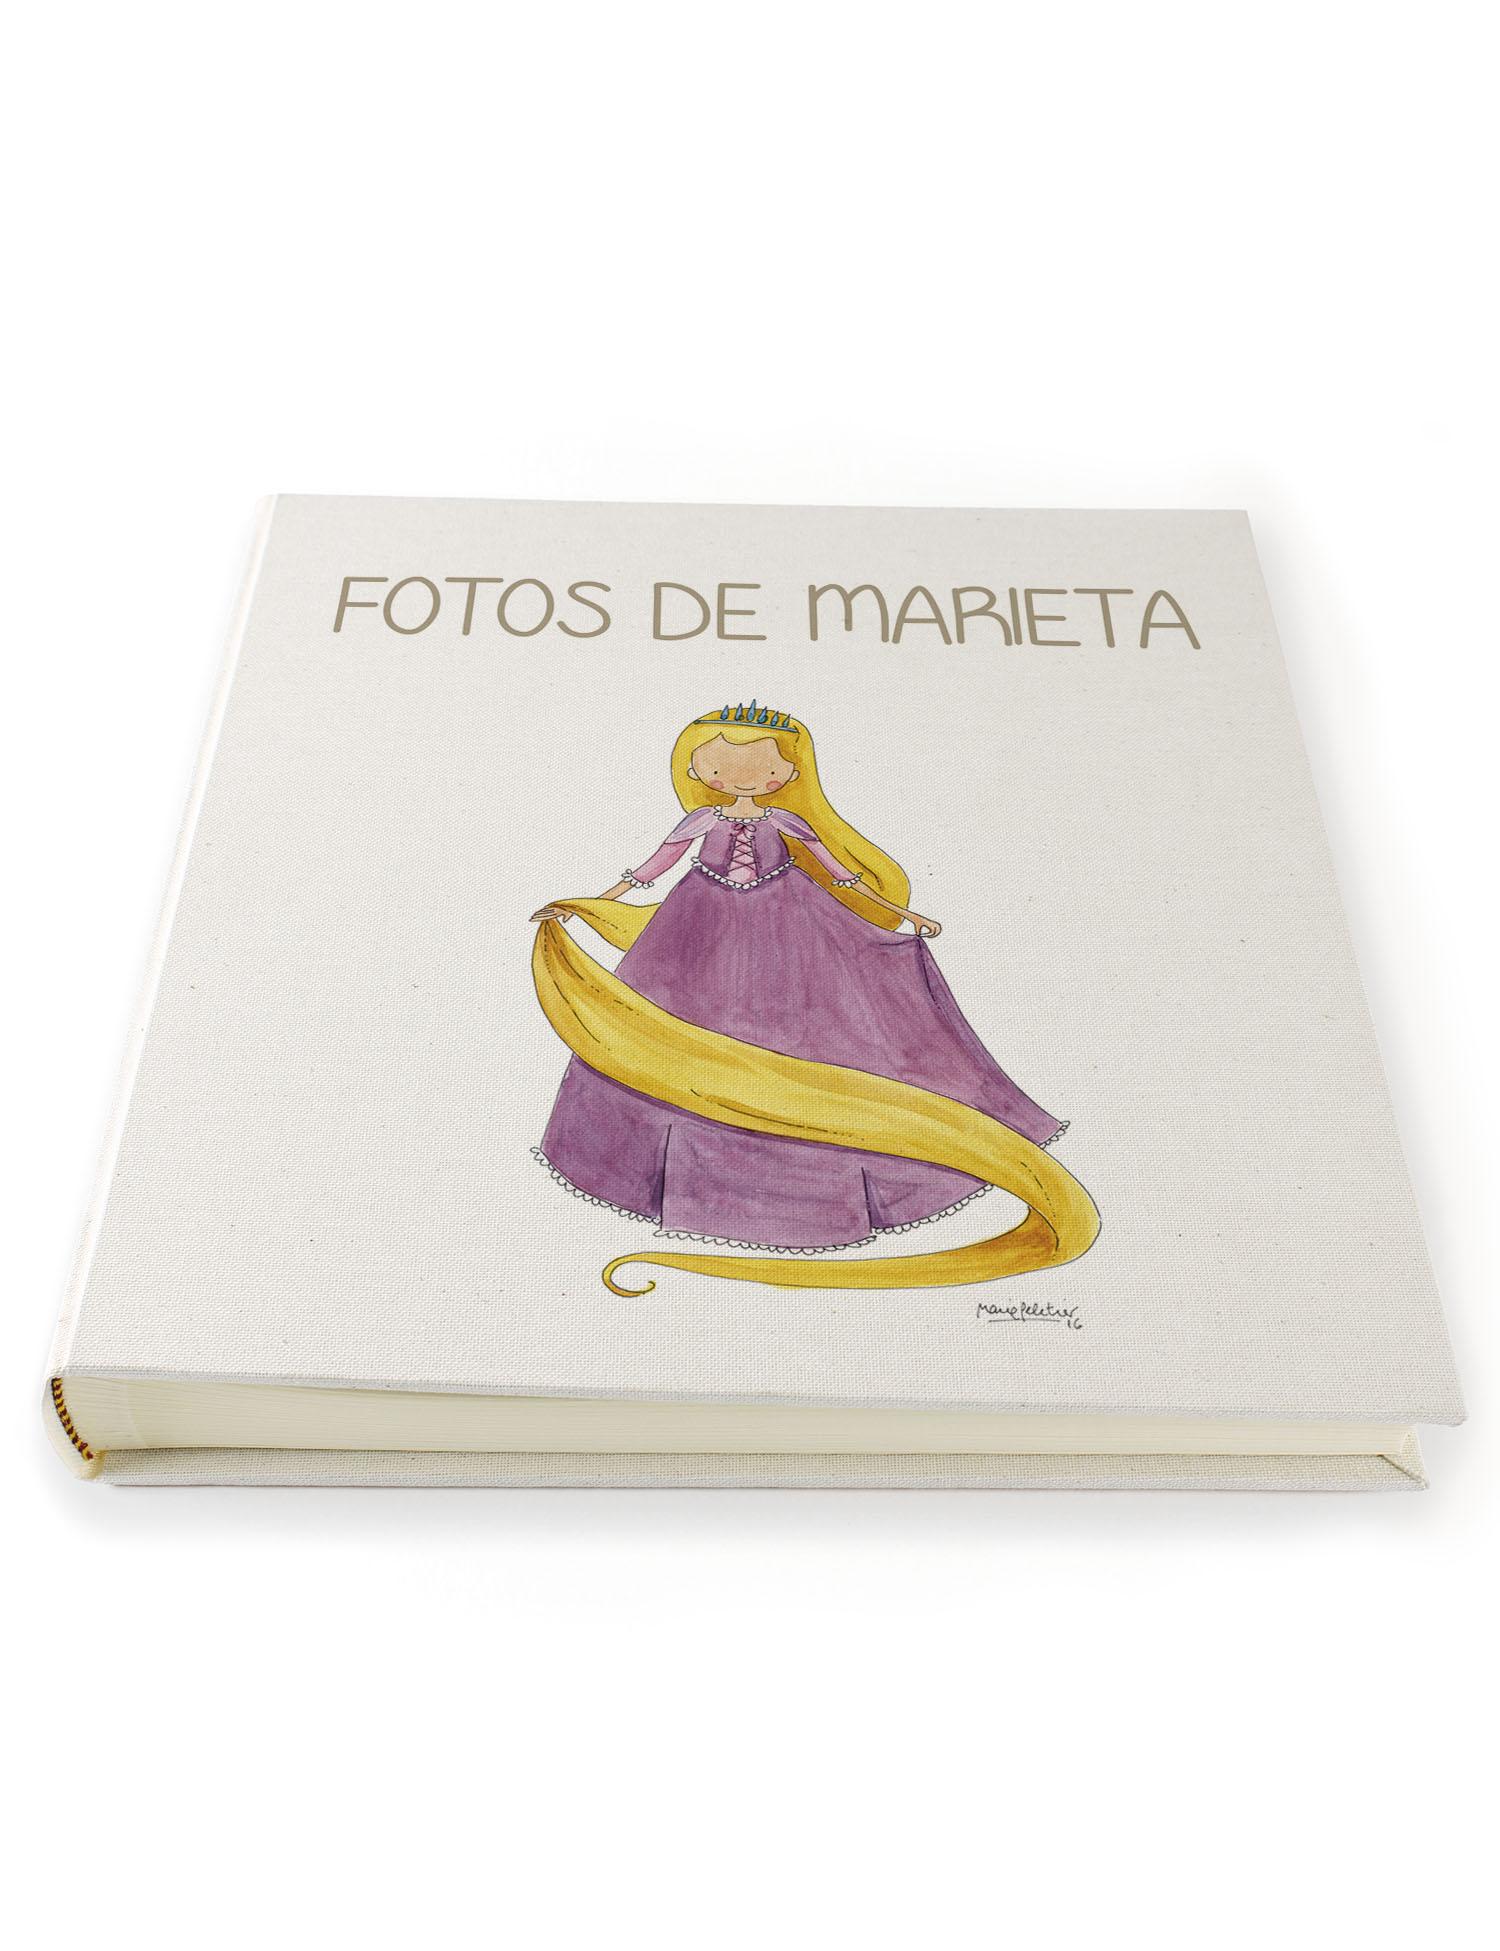 ALBUM RAPUN PERS min - Album Princesas Rapunzel